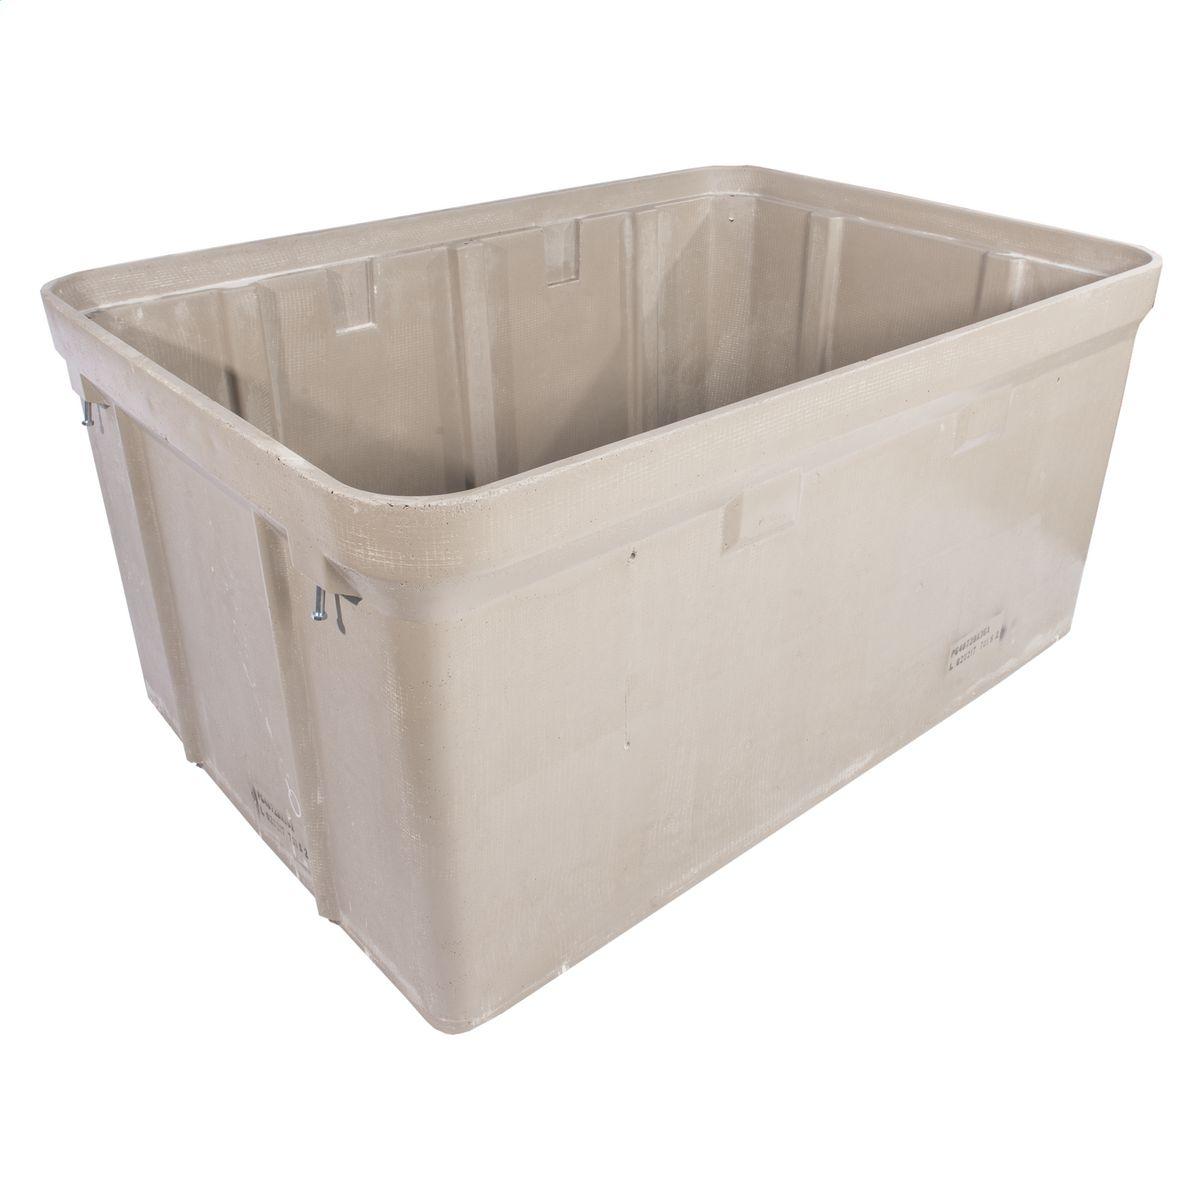 Potting Box Acrylonitrile Butadiene Styrene 1 piece MULTICOMP PB2 Enclosure 40 mm 40 mm Black 20 mm ABS